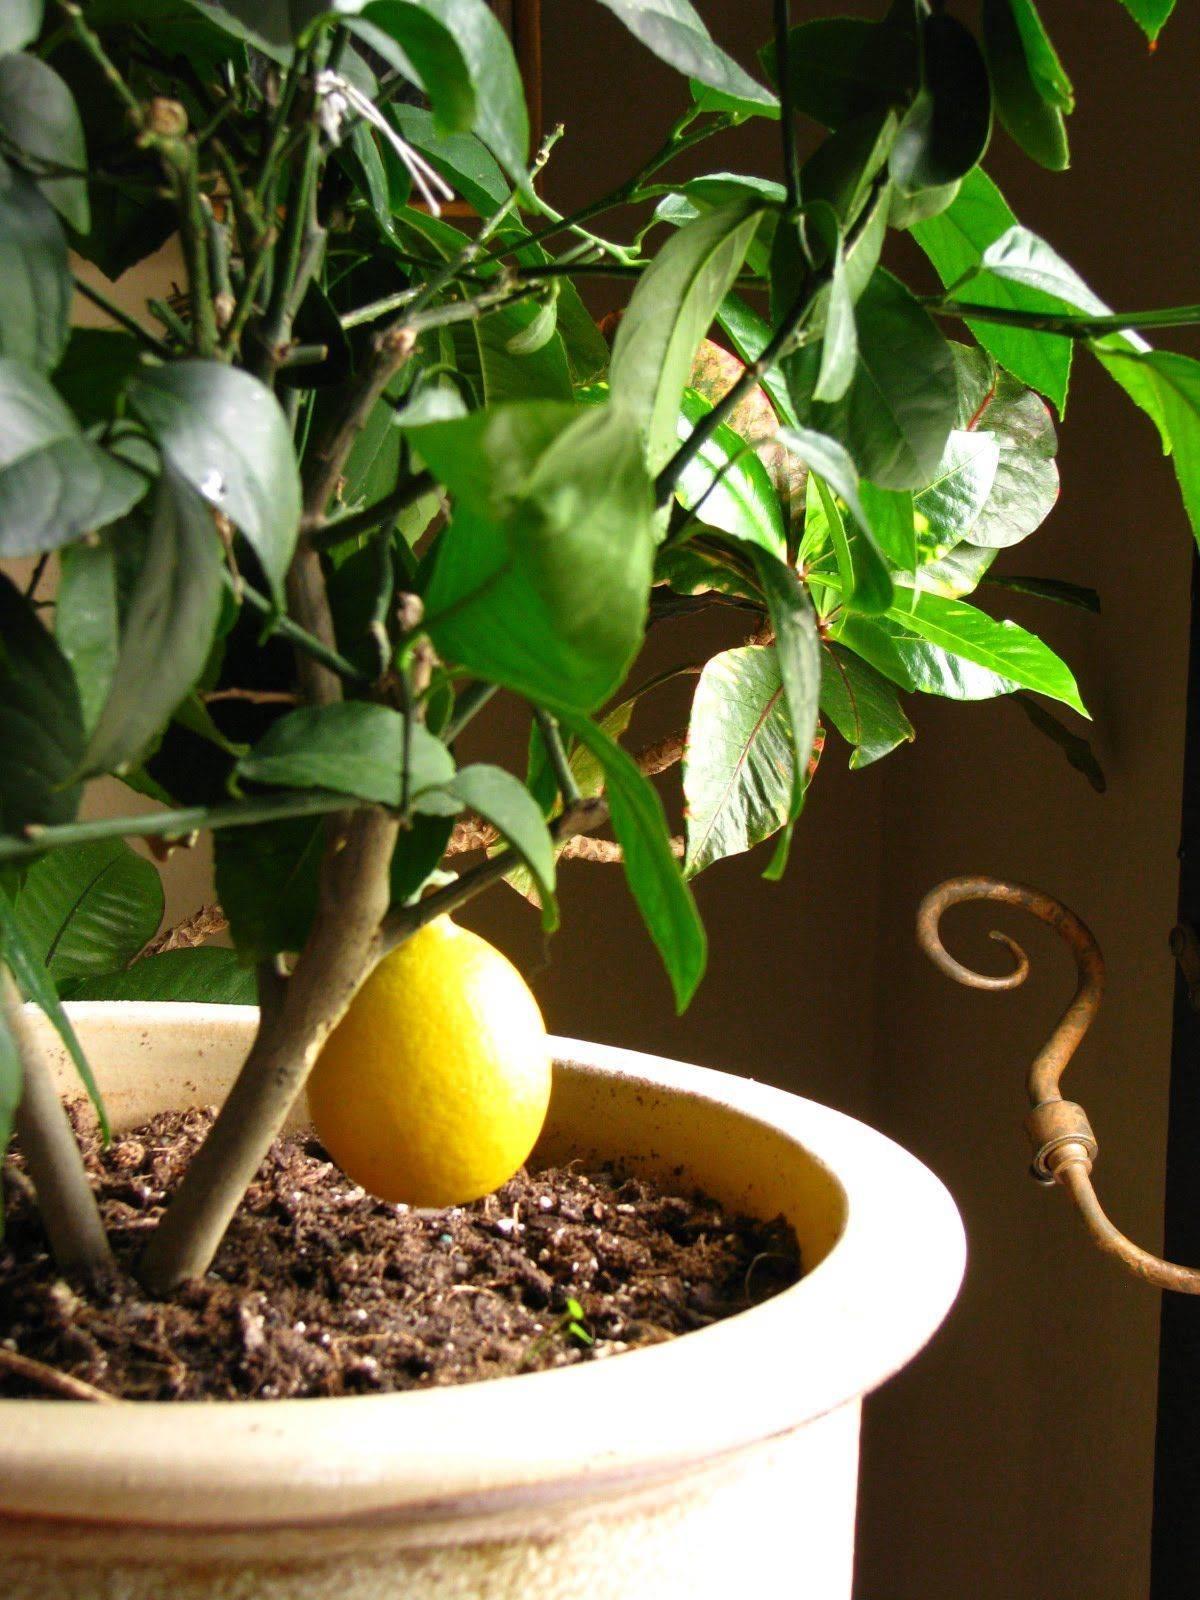 Лимон лунарио: описание сорта, выращивание и уход в домашних условиях, фото